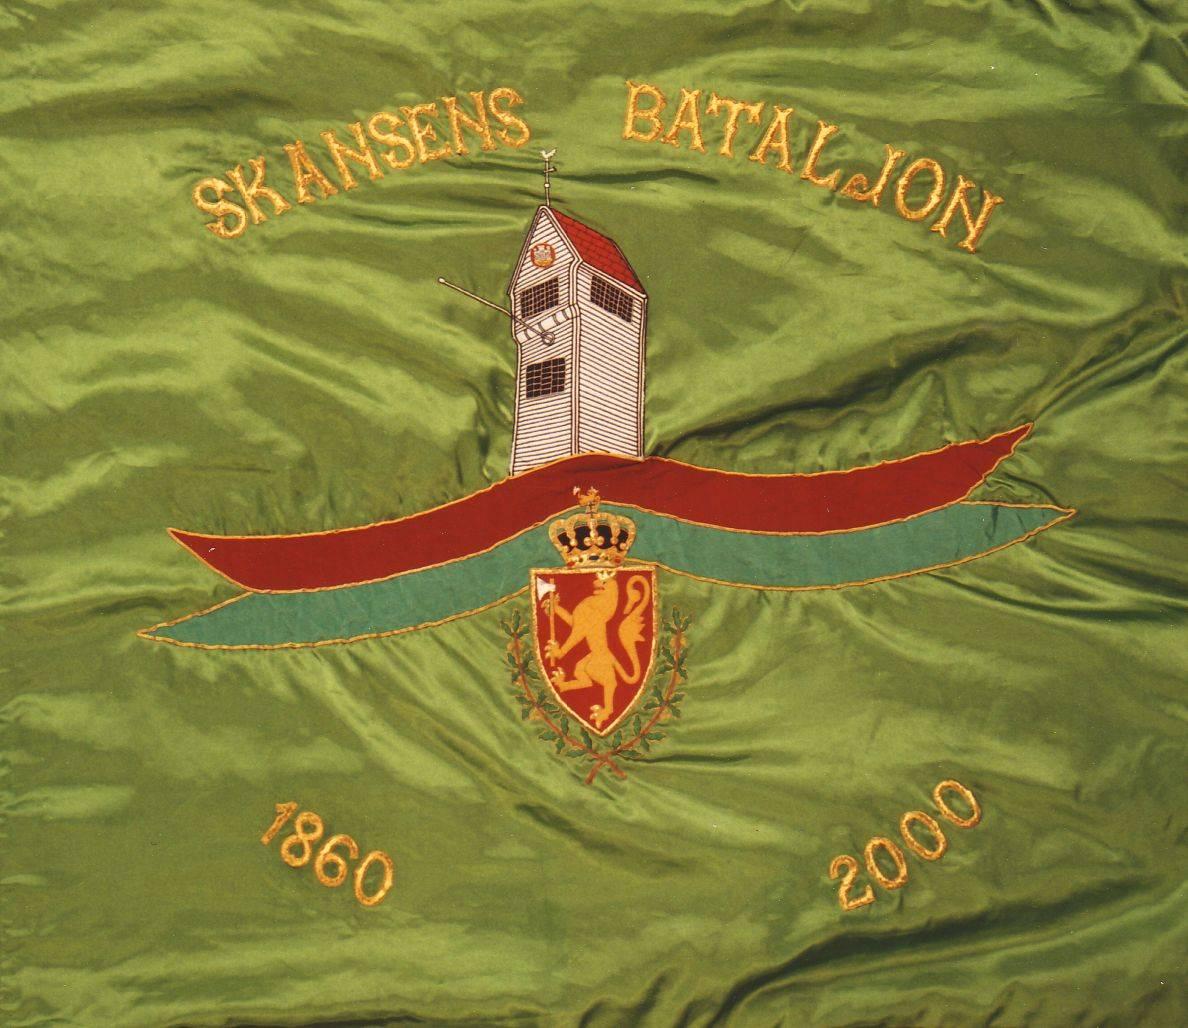 Skansens Bataljon